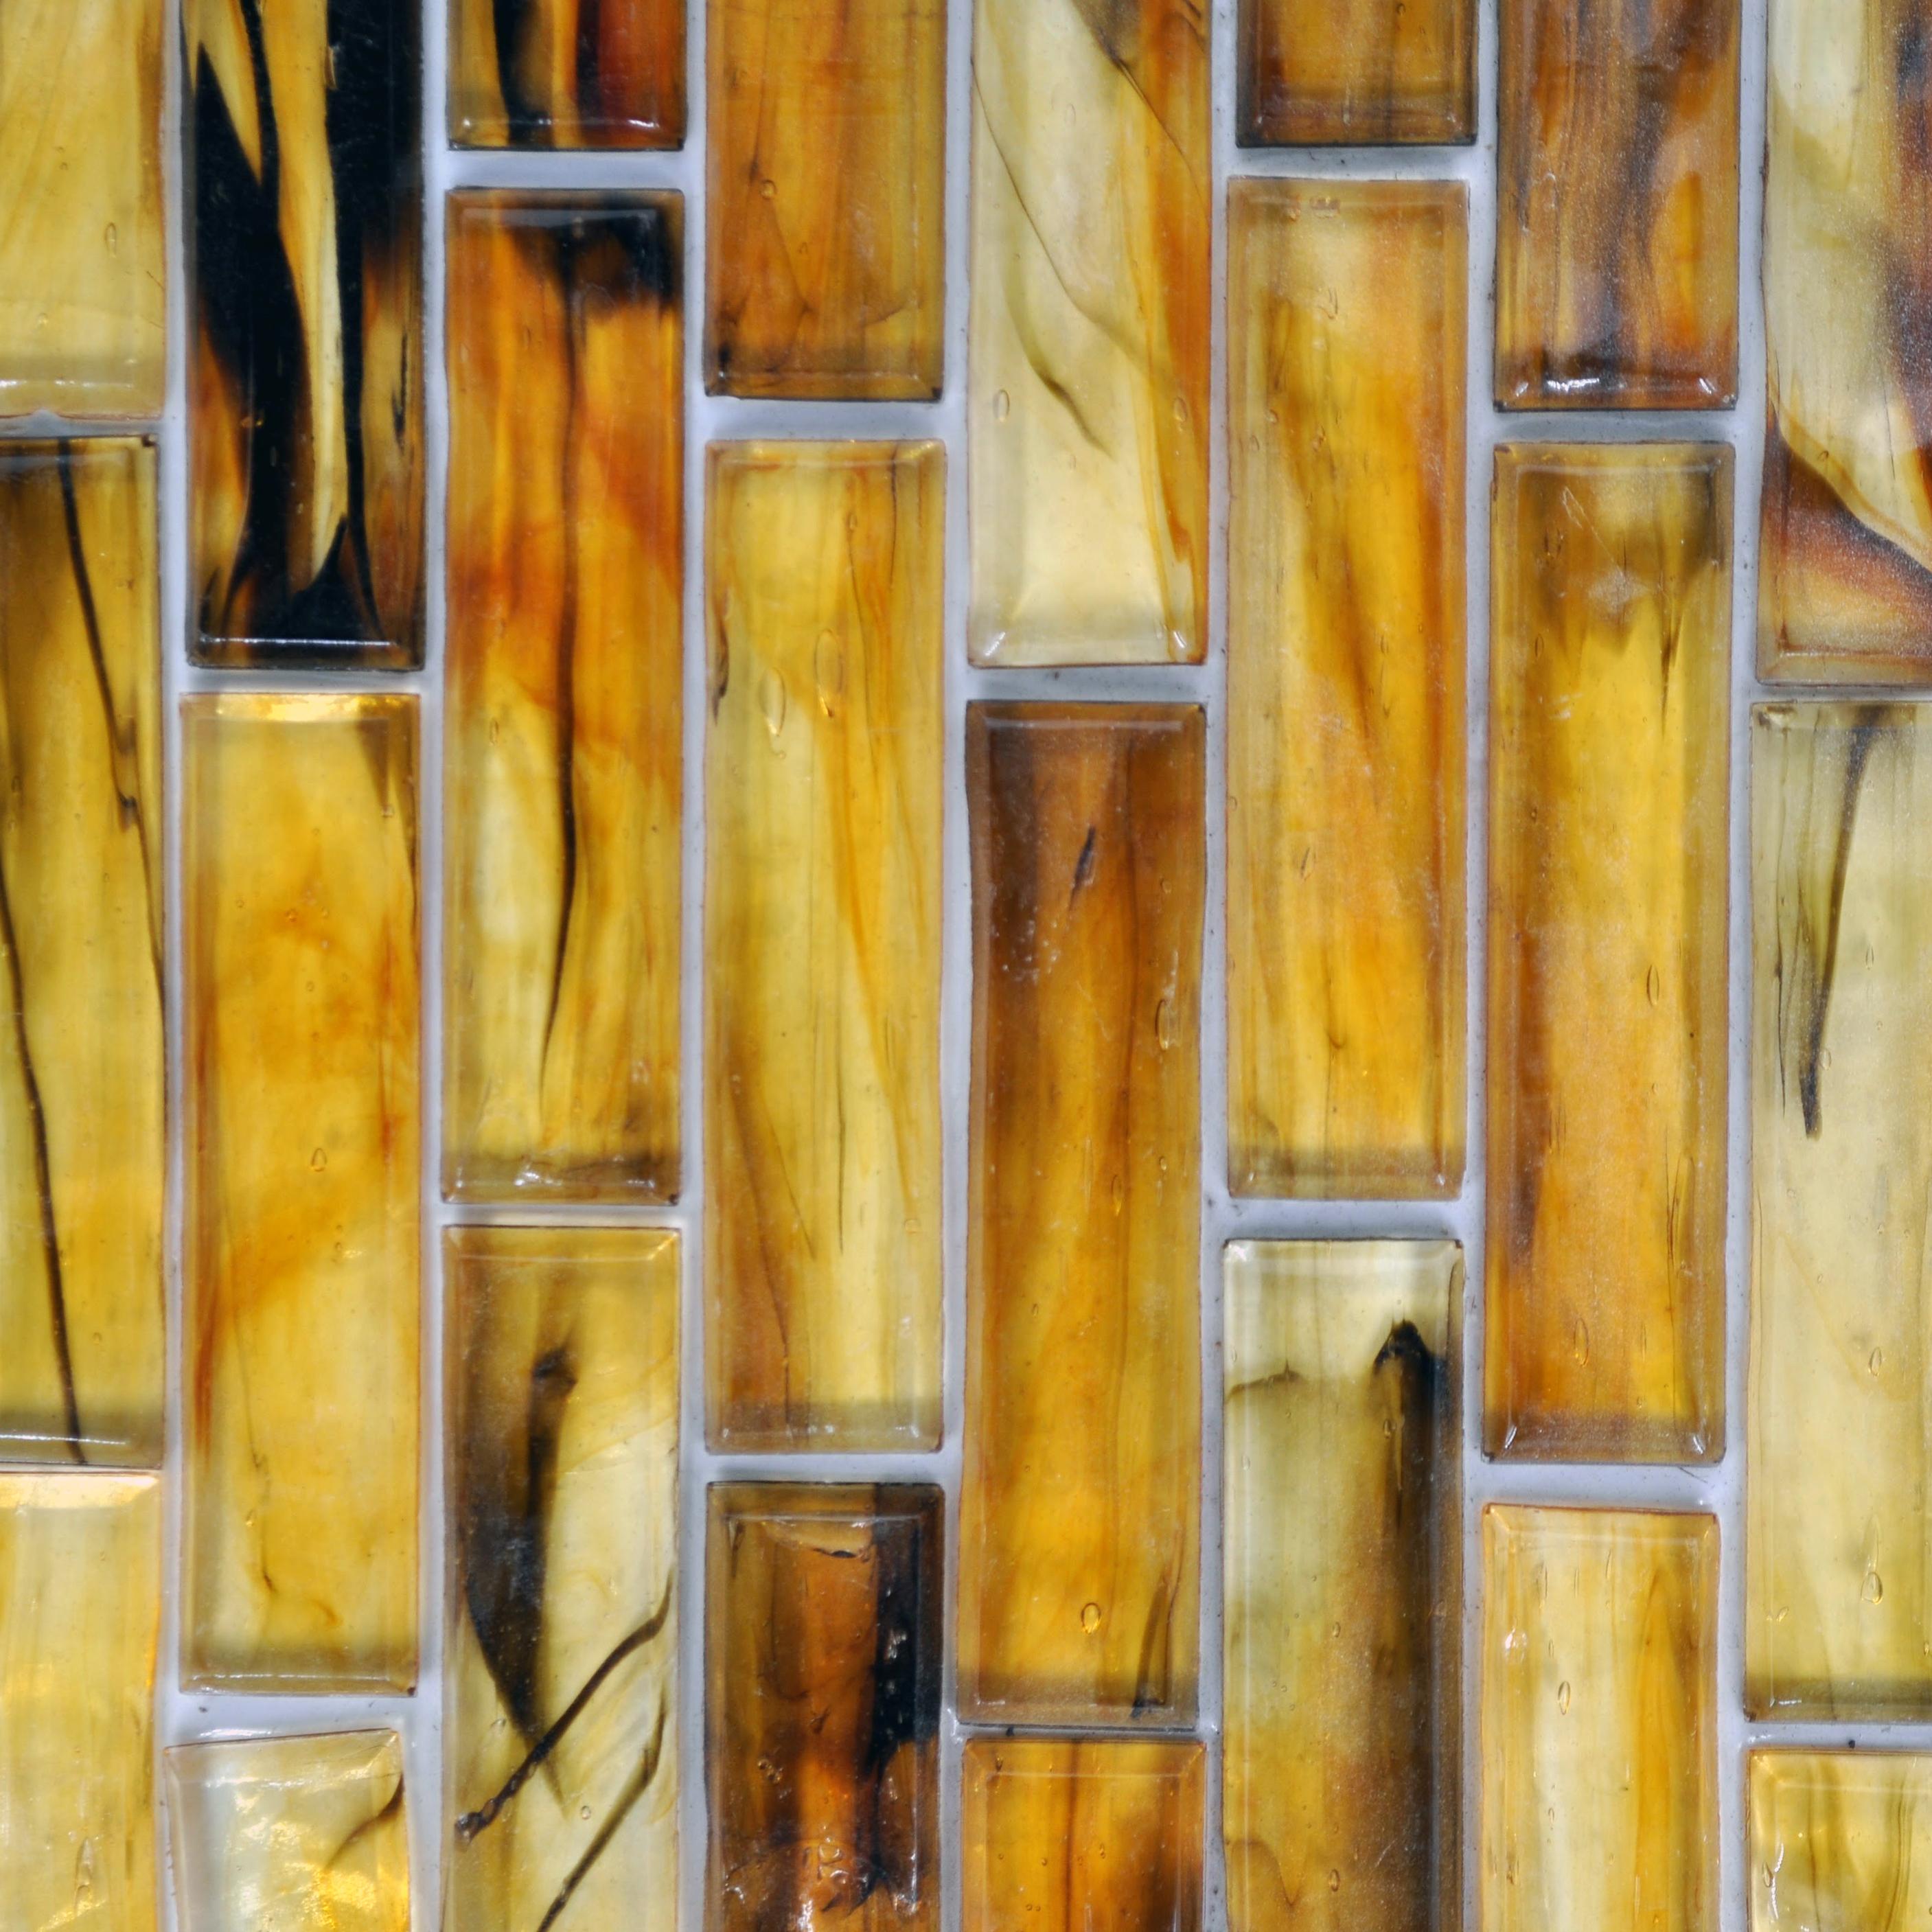 Fusion glass autumn07s 1 x 4 linear strips bella casa for Bella casa tiles